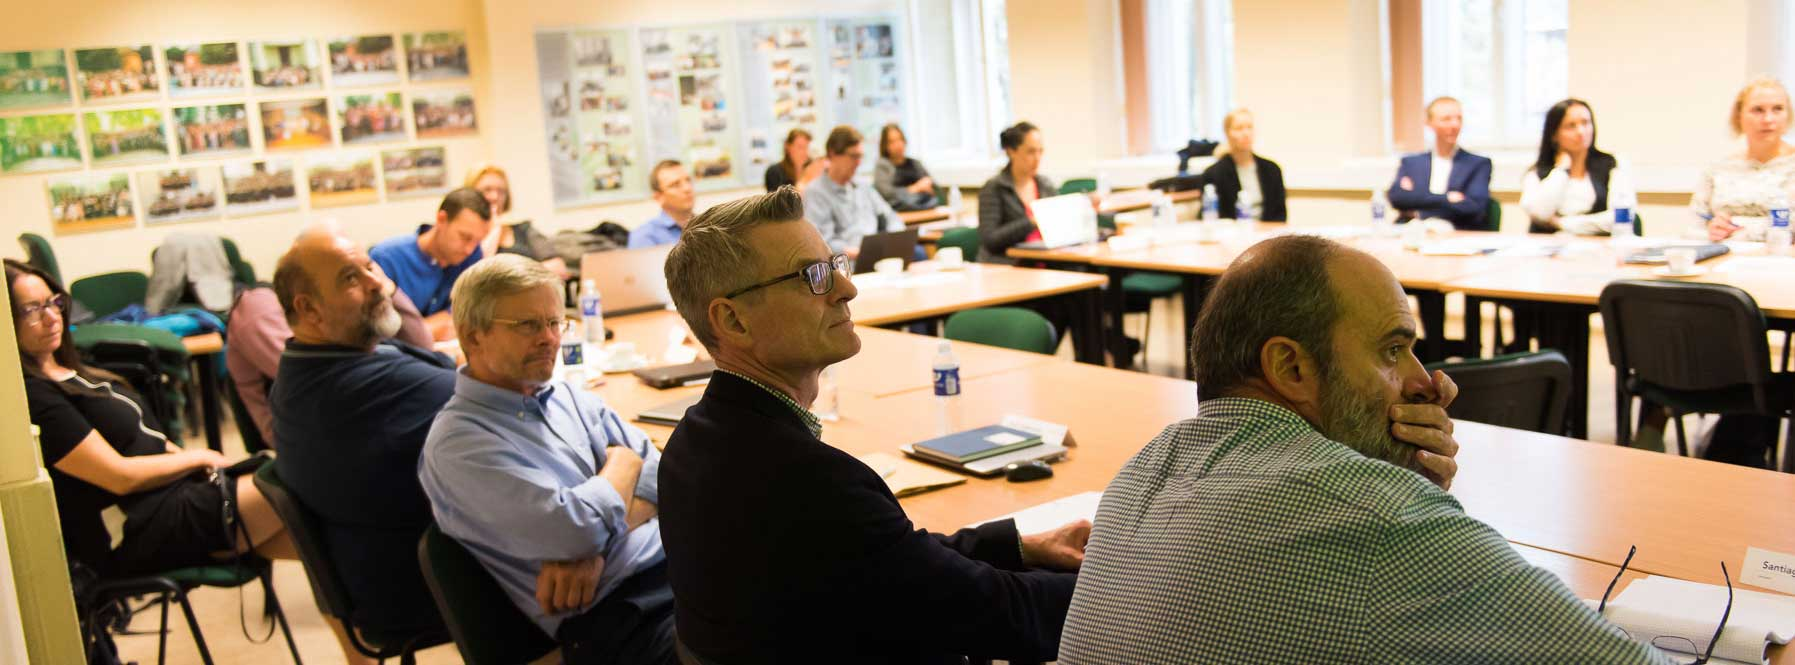 KTU Hosted ECIU Leadership Development Program